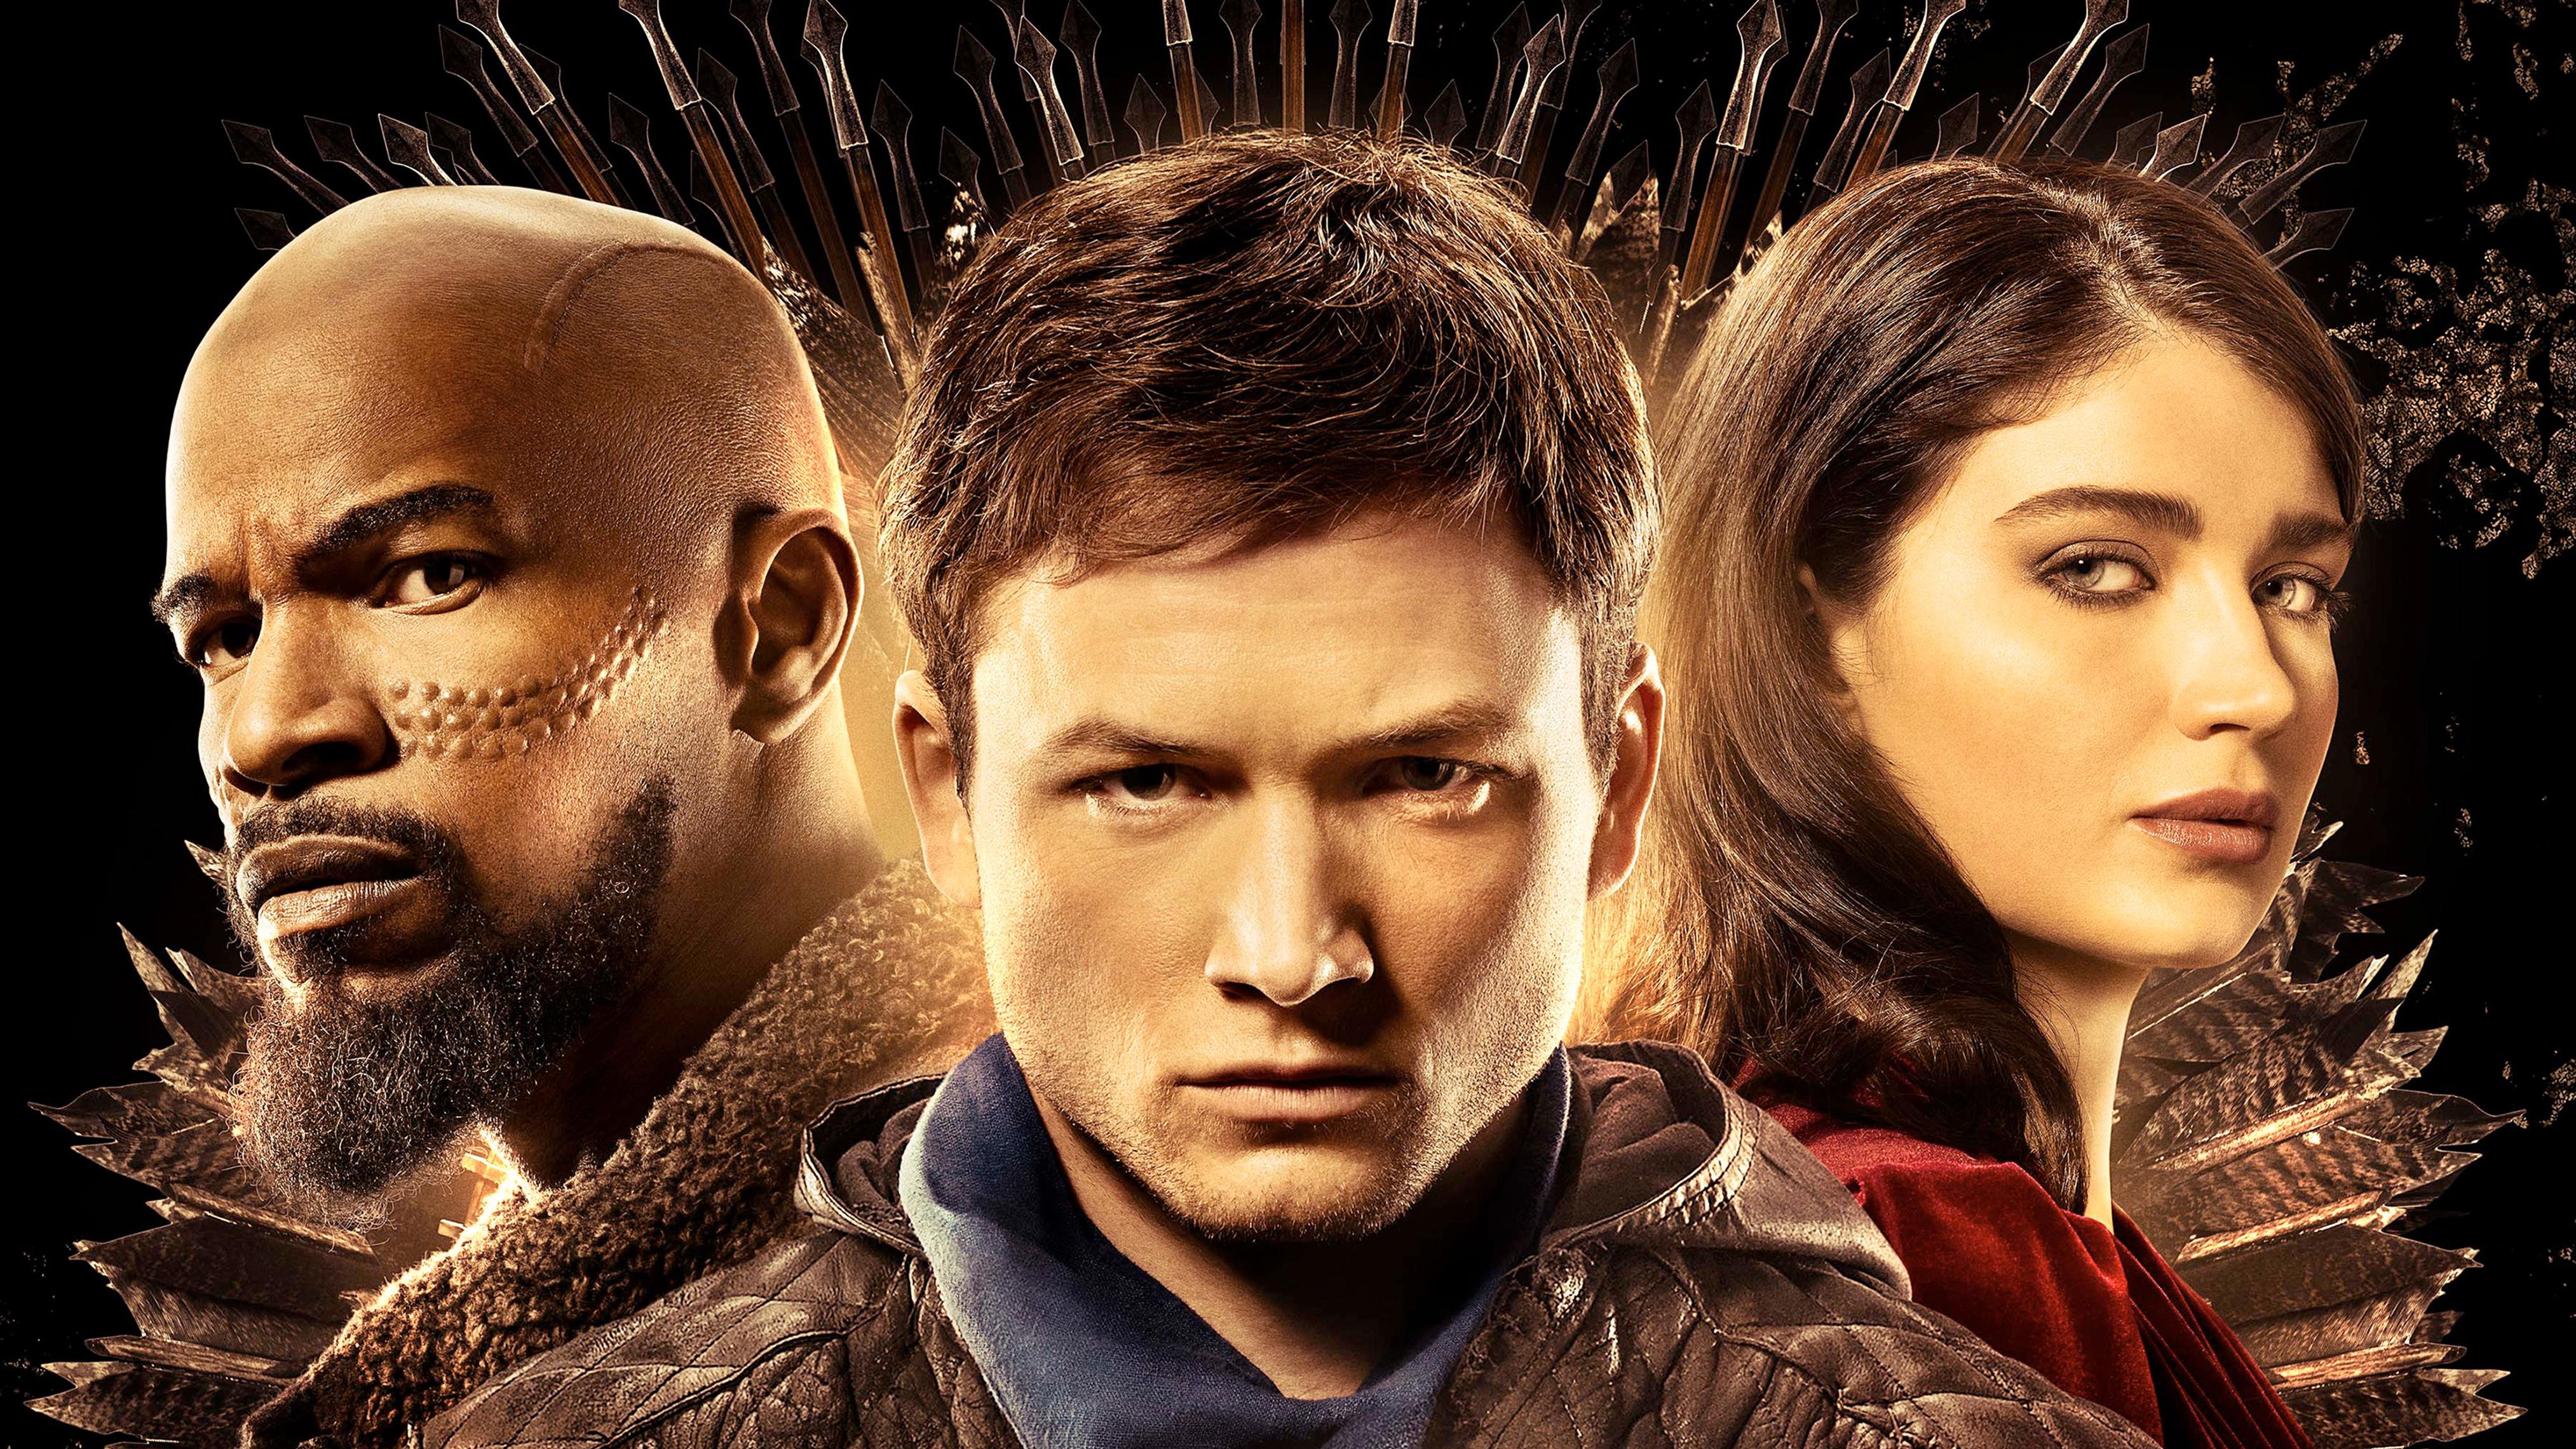 Robin Hood Film 2019